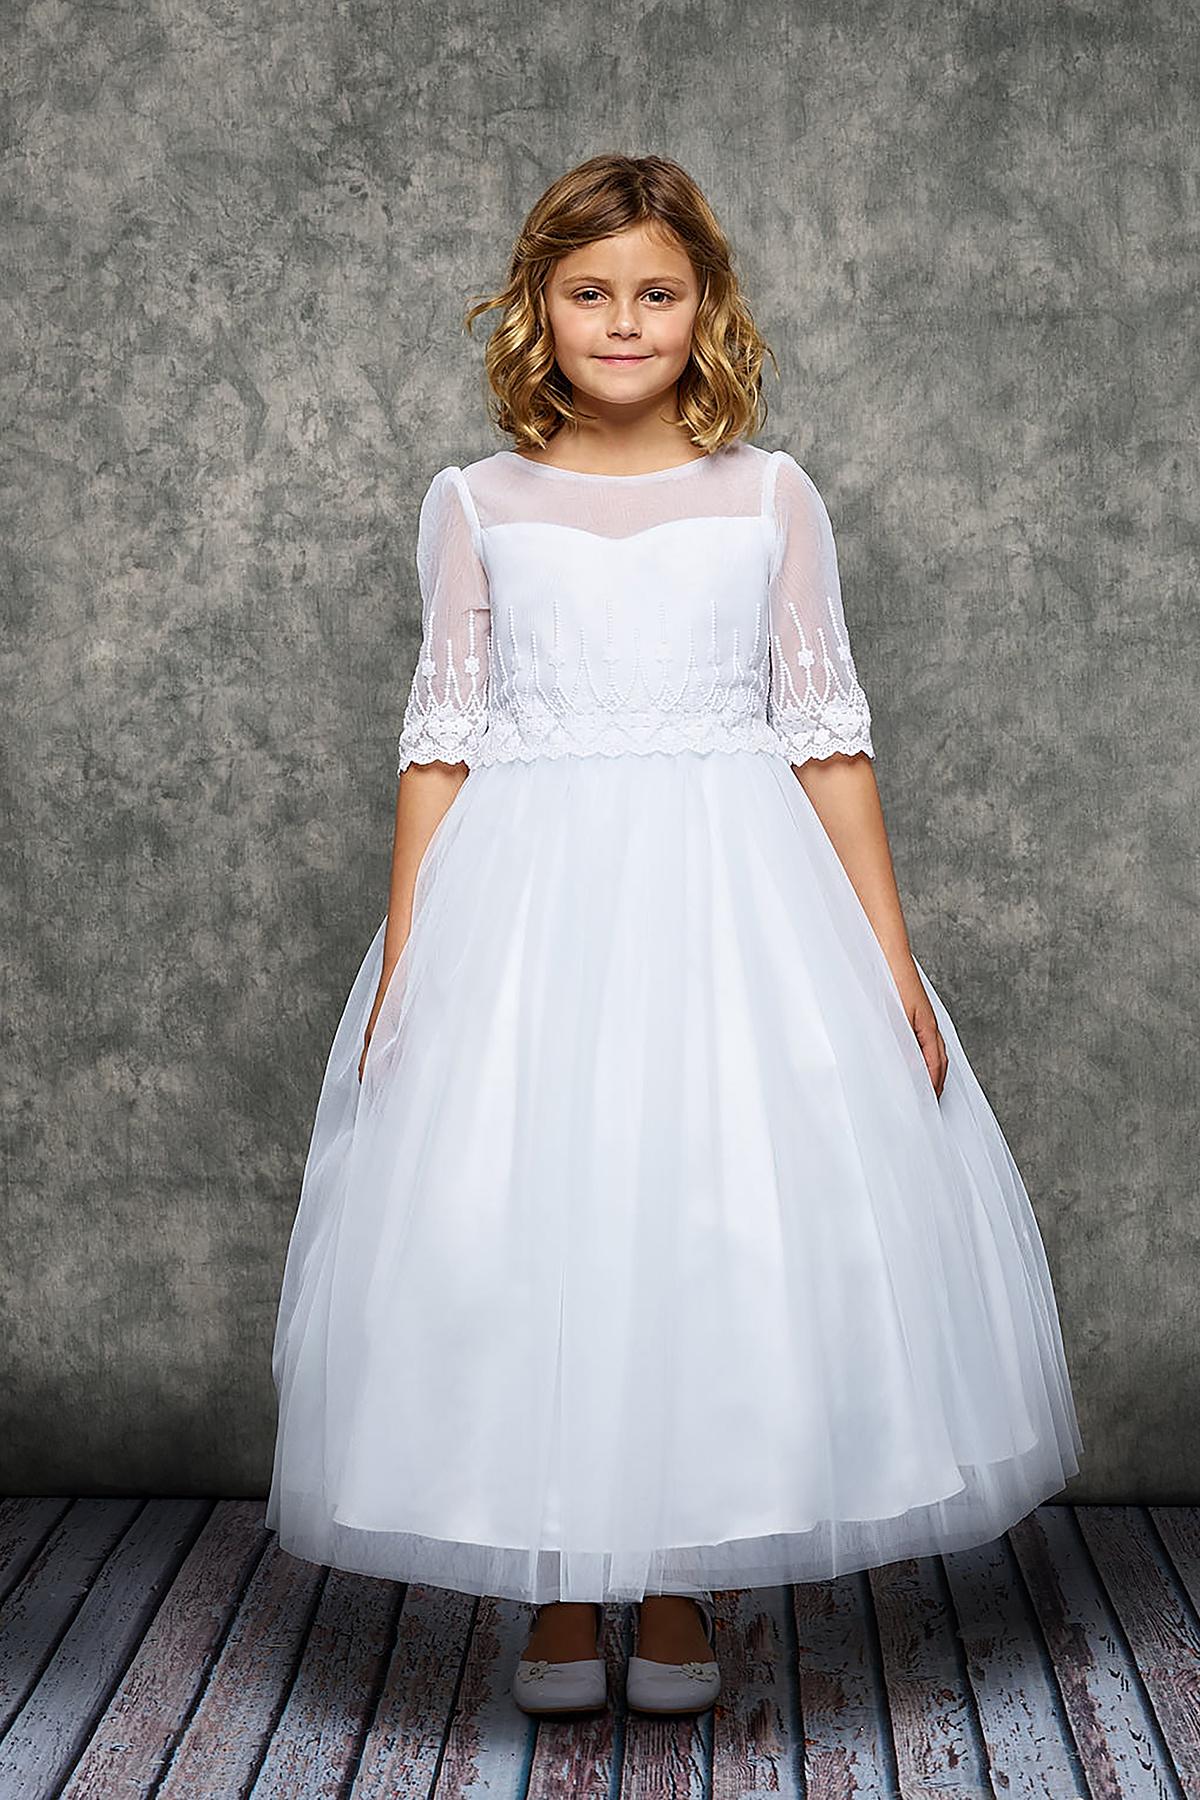 A Embroidery Mesh Half Sleeve Girls Dress -White - Grandma ...